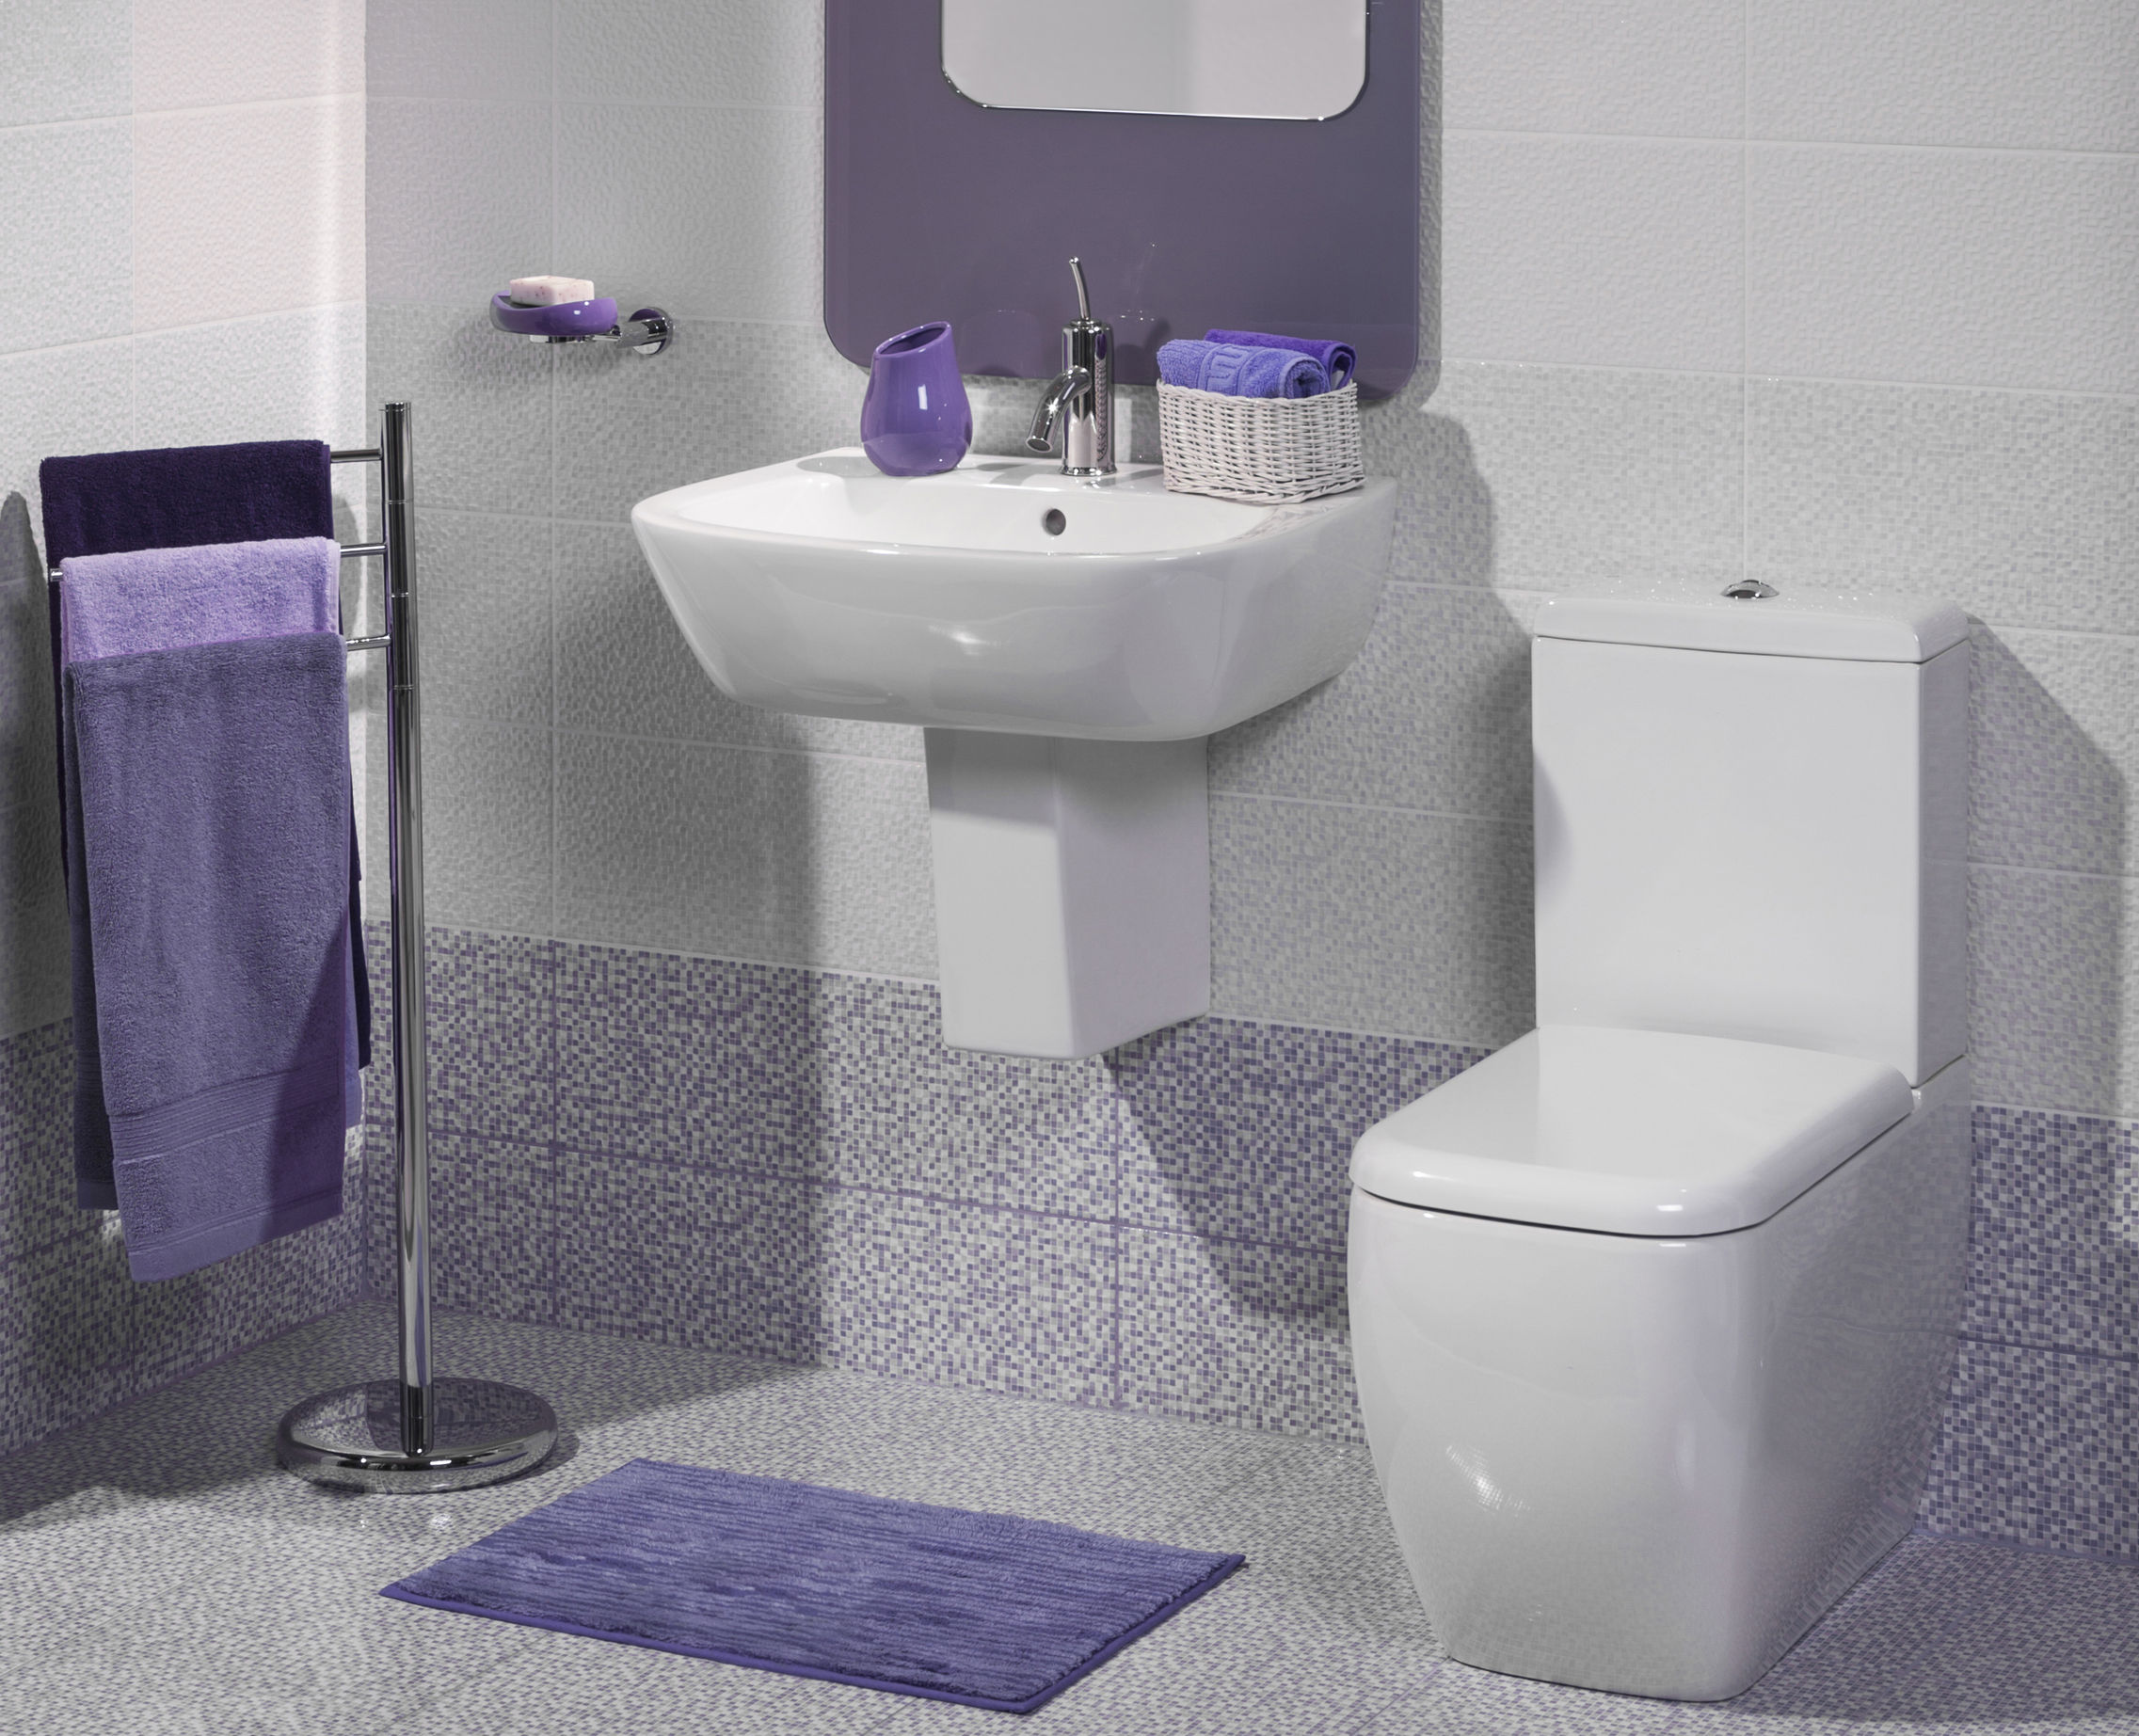 csapuniverzum_blog_32_toalett_t_rt_nelem.jpg